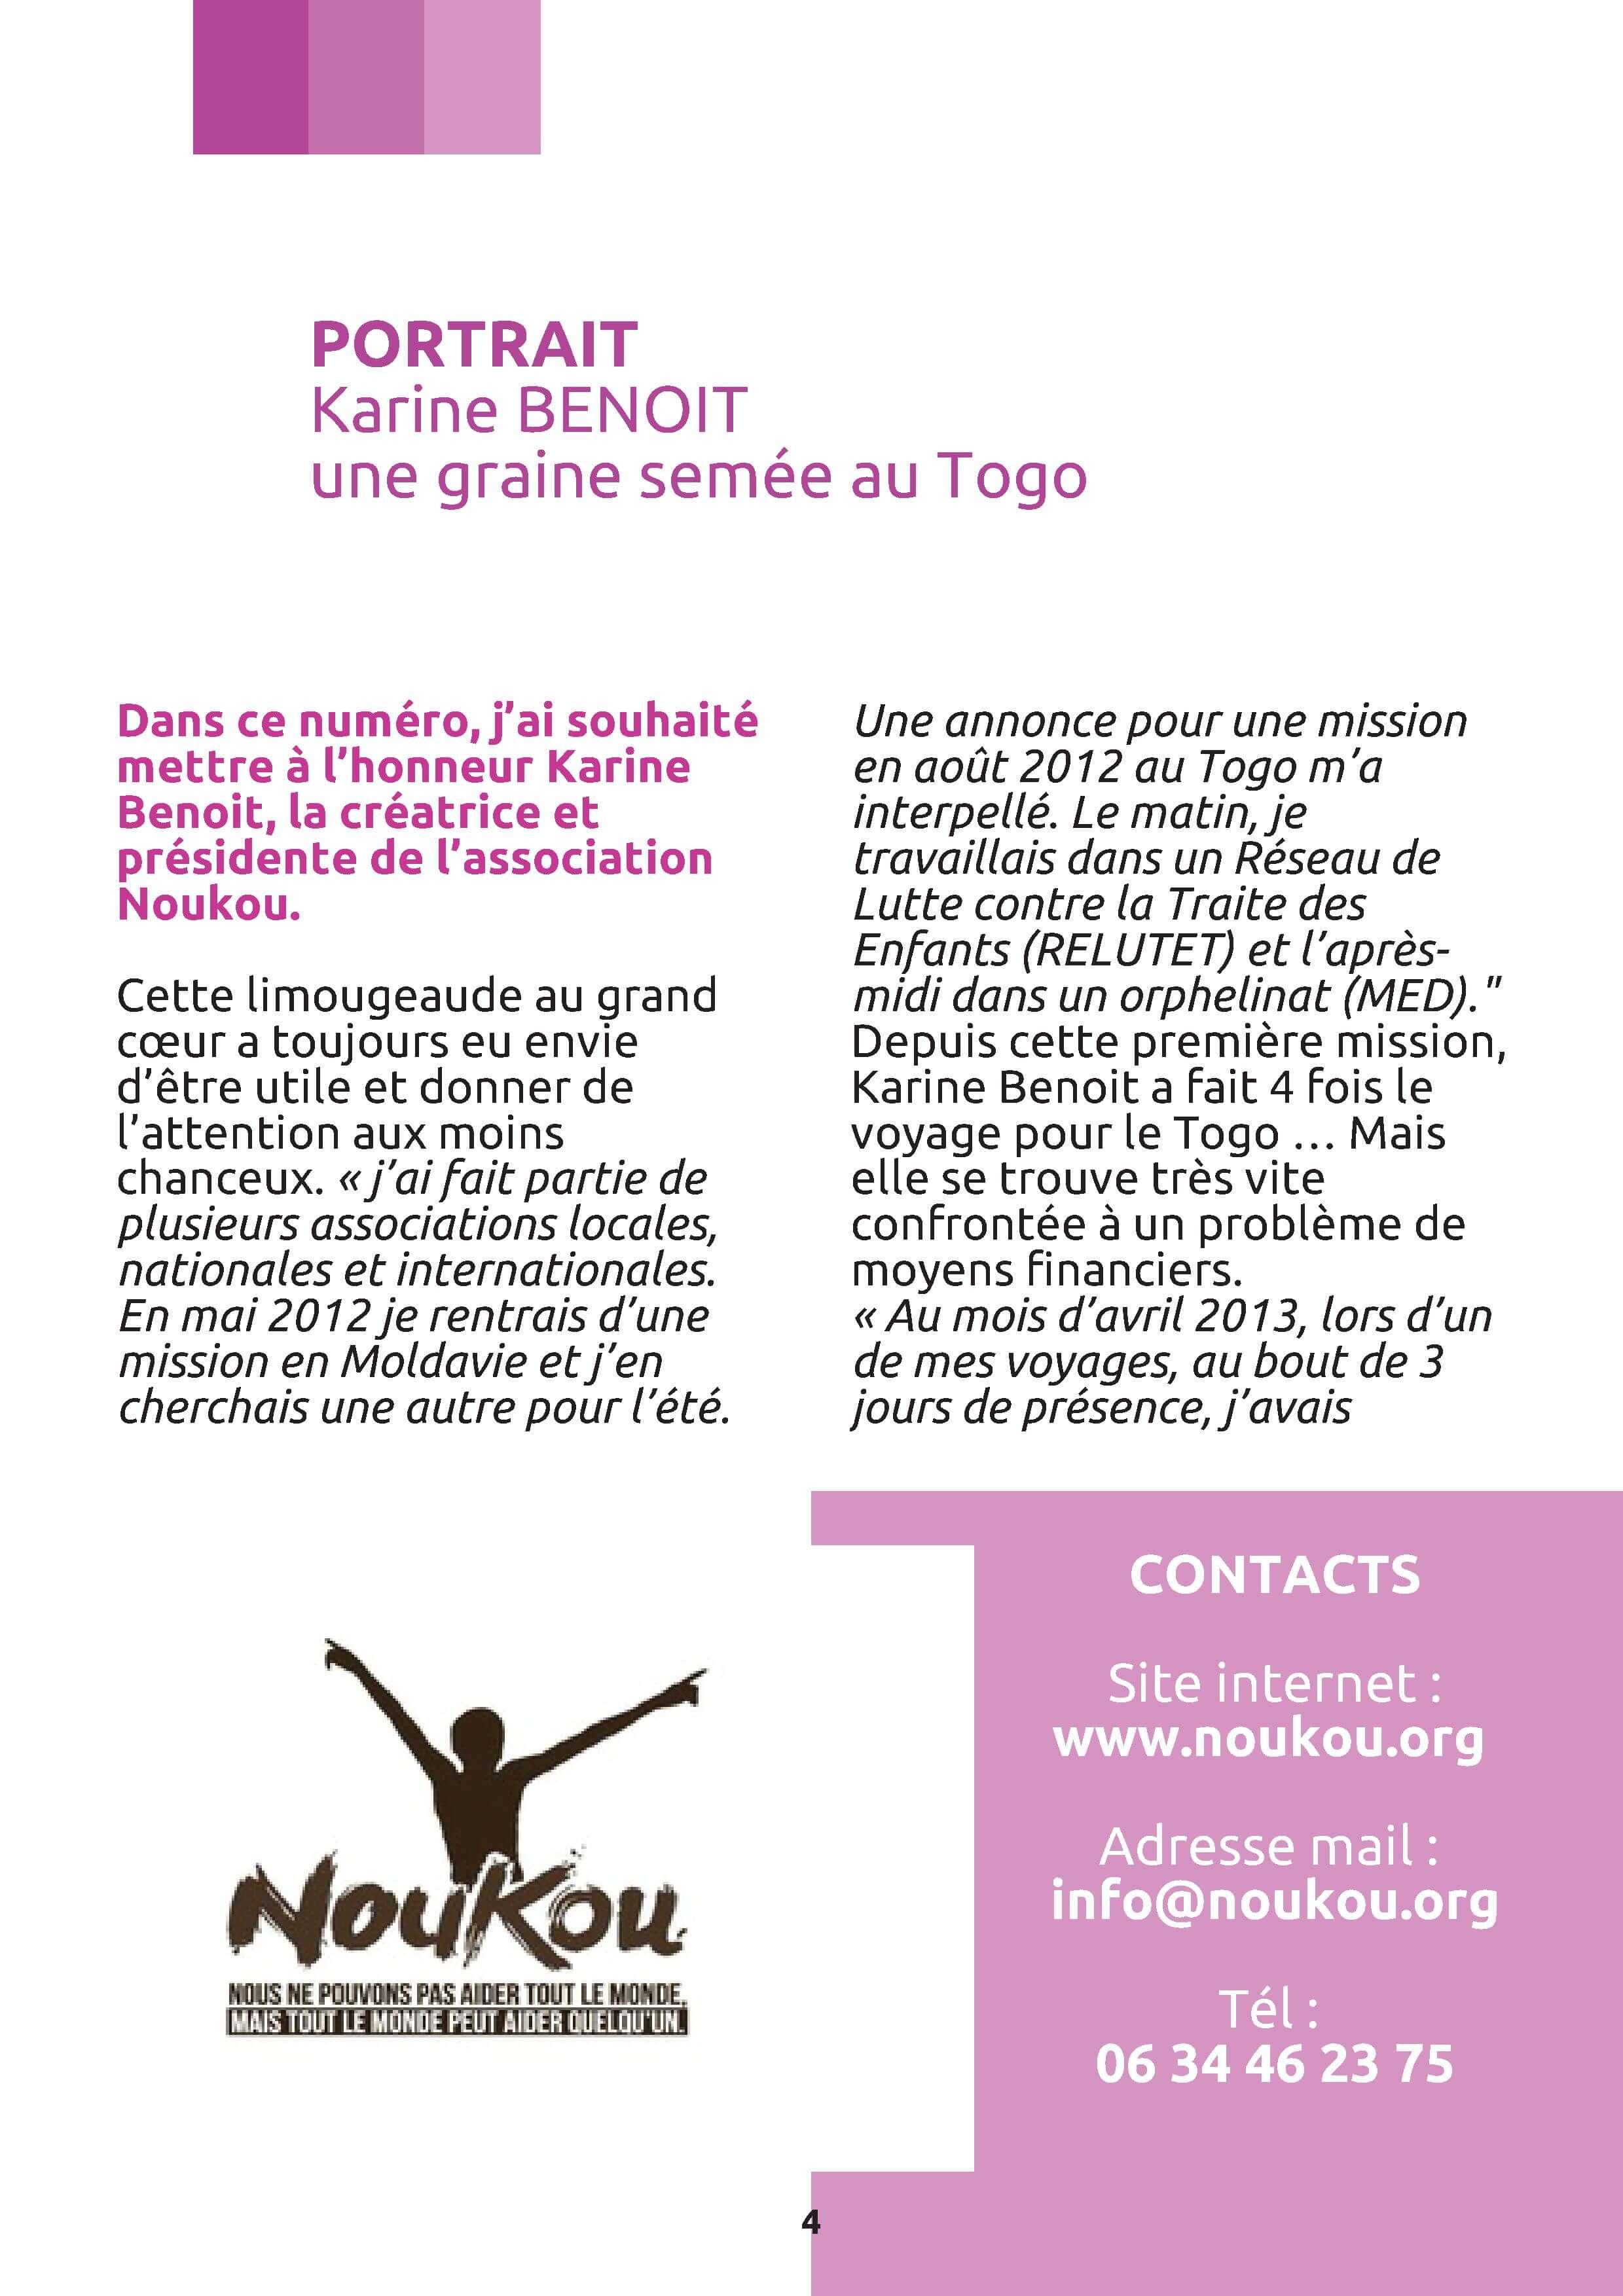 article-karine-benoit-p.1-magsesame-n°-7-Novembre-2013